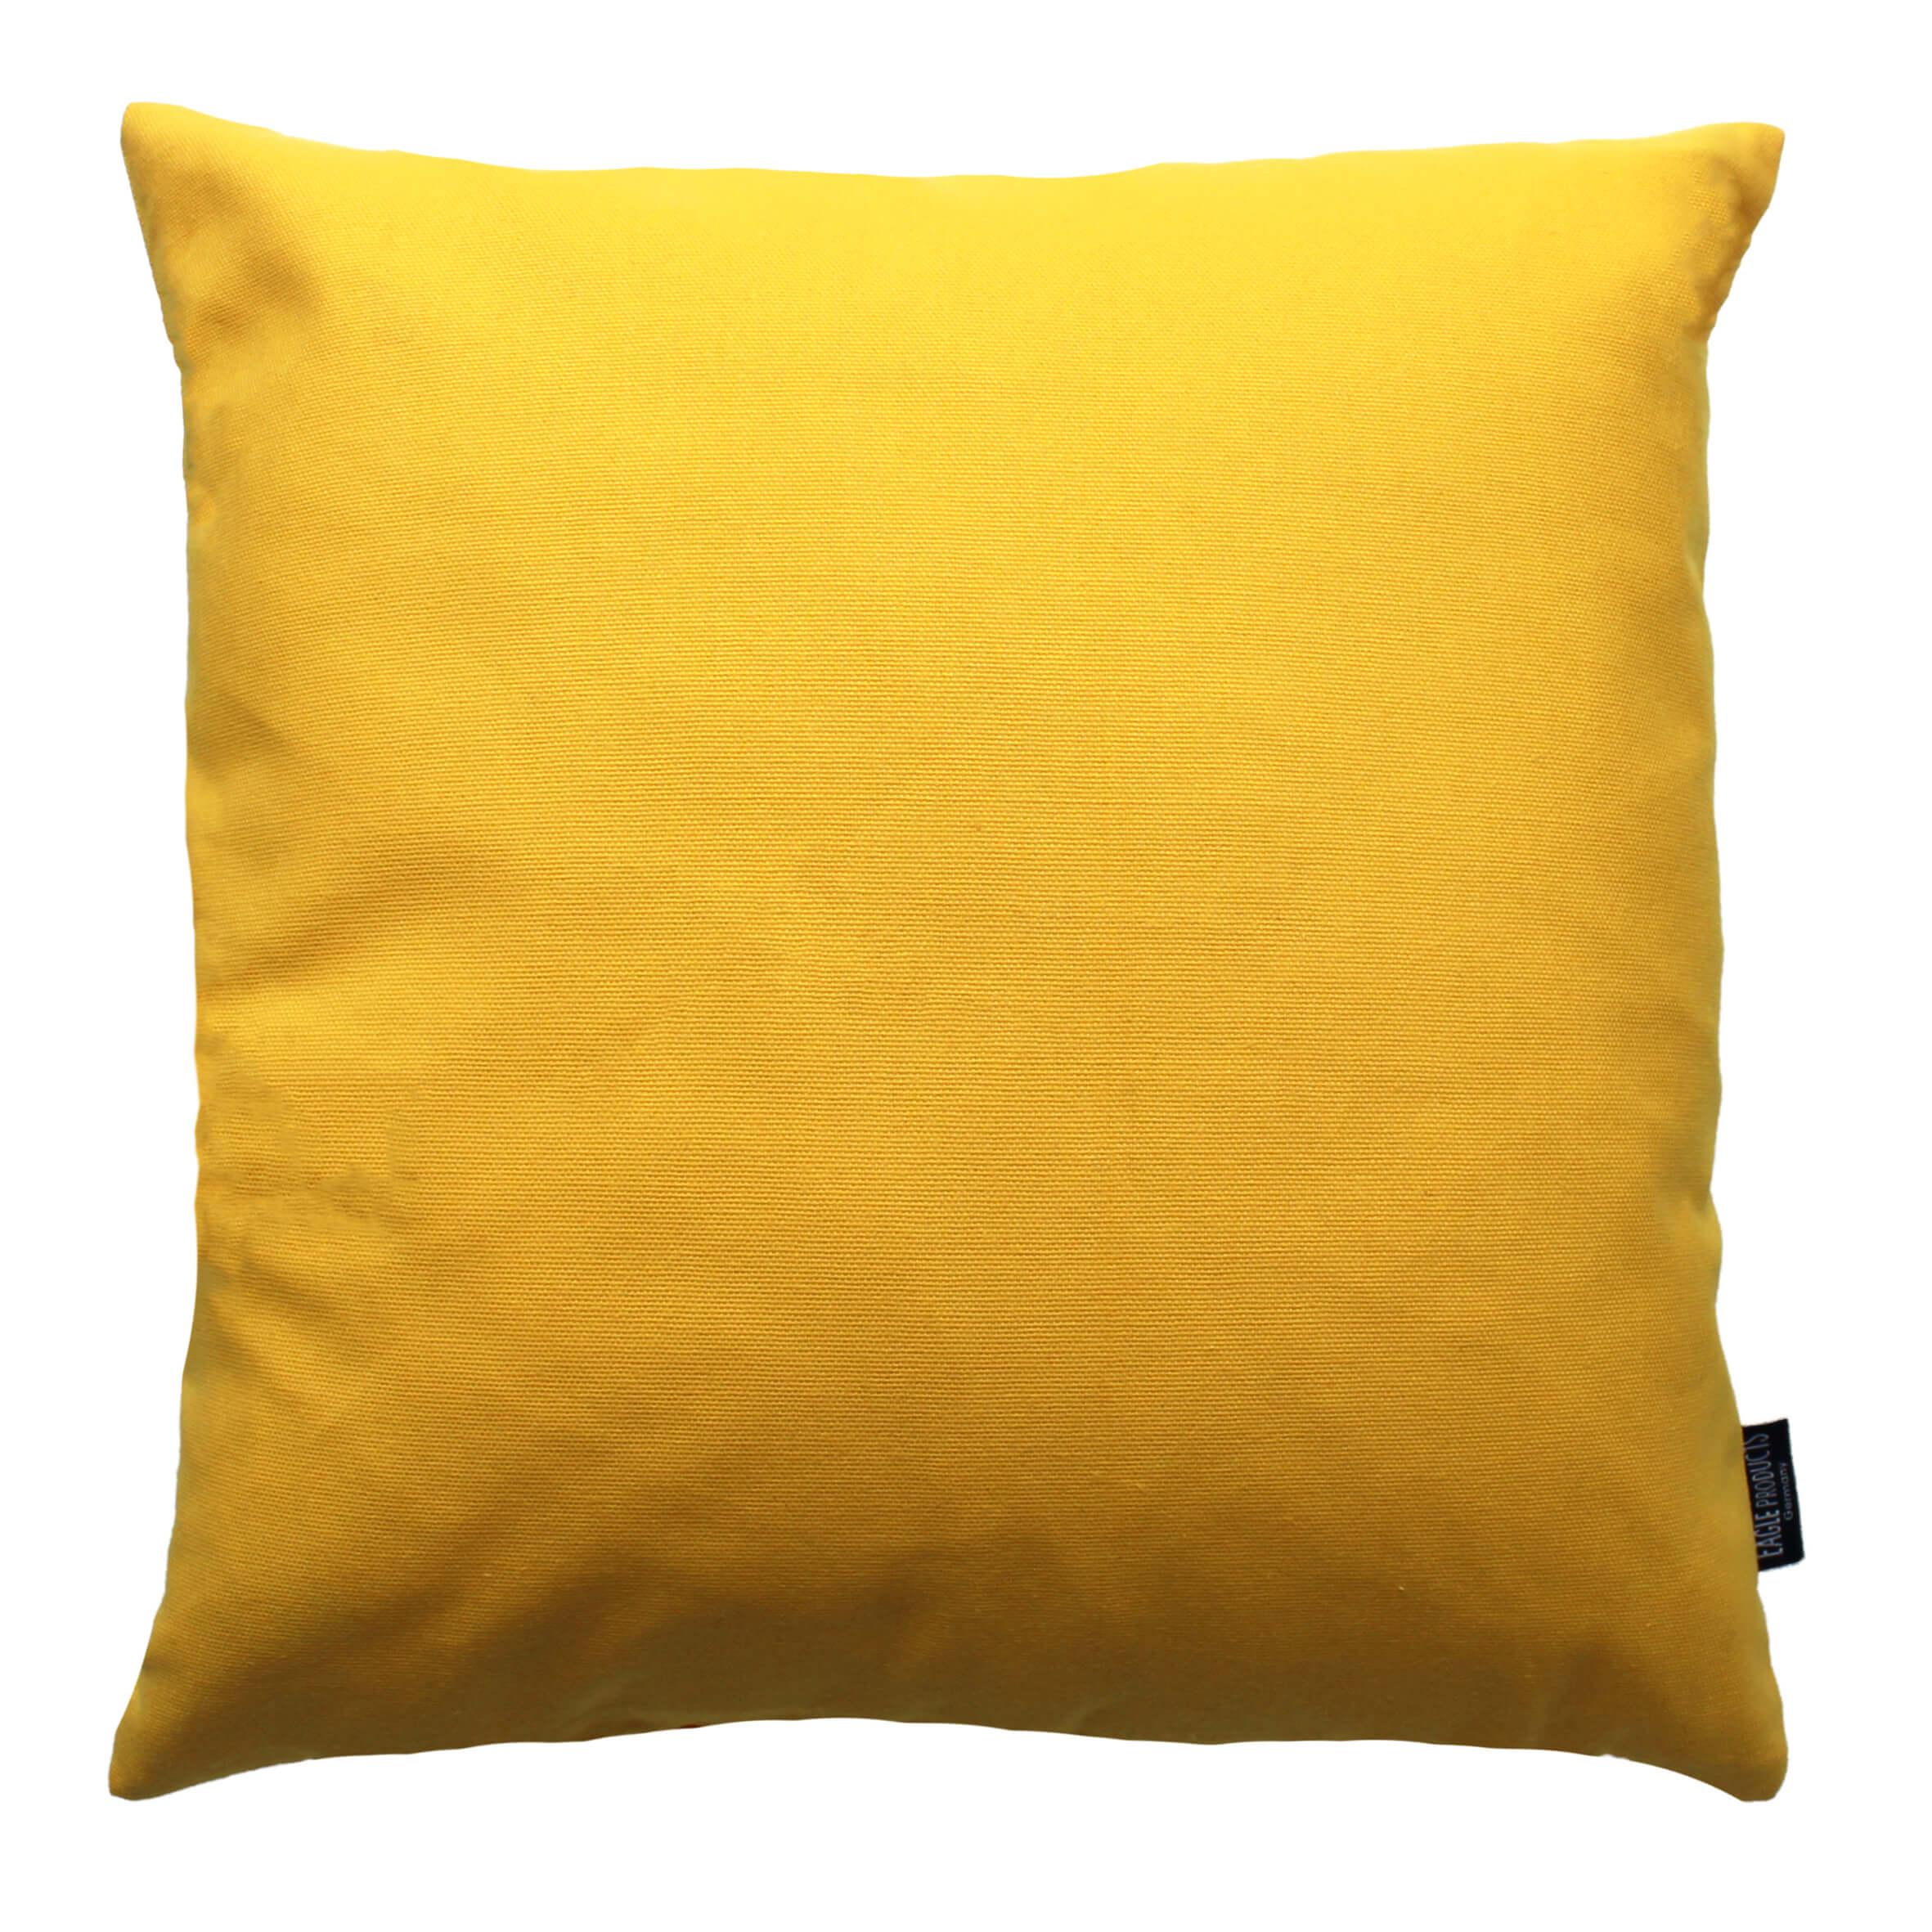 Bild von Capri-S18, Variante gelb